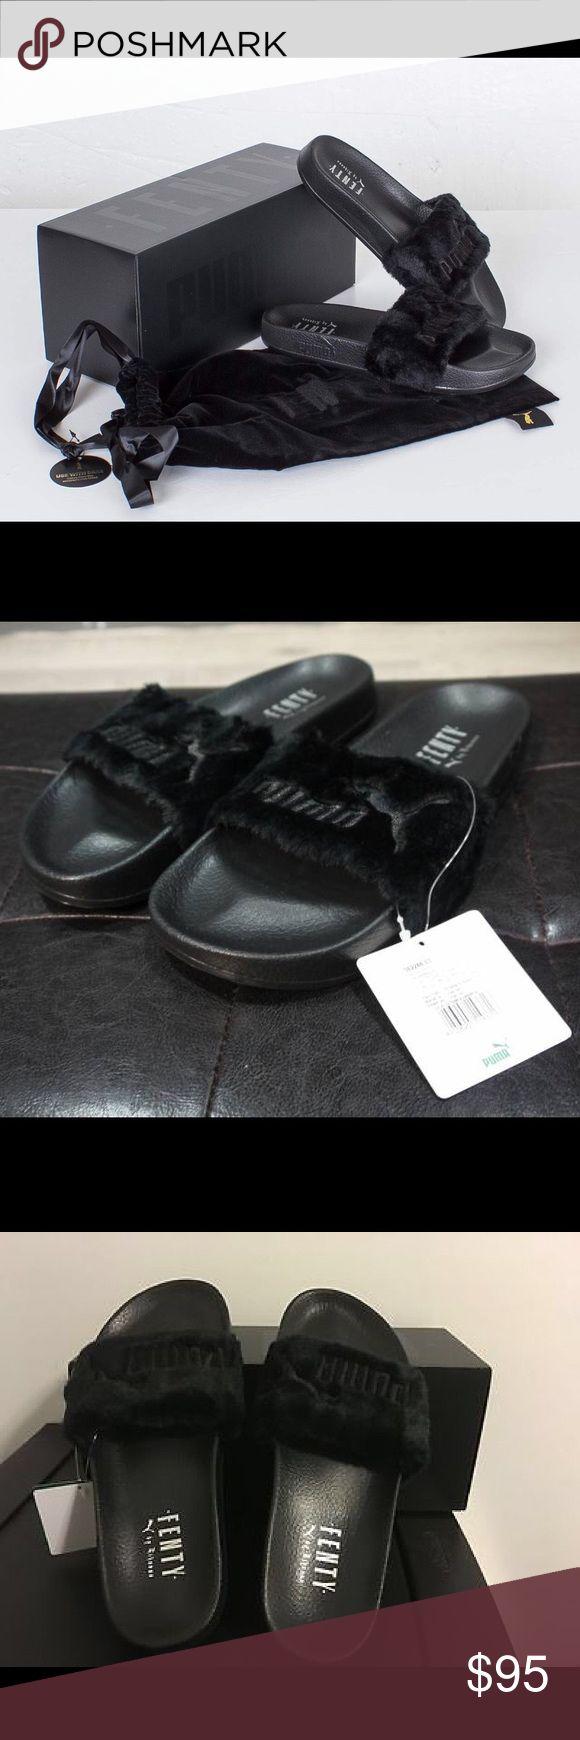 Rihanna Puma fenty slides Black (sz. 6.5) 100% original new in box with velour dustbag. Rihanna puma fenty slides in US size 6.5 Puma Shoes Sandals